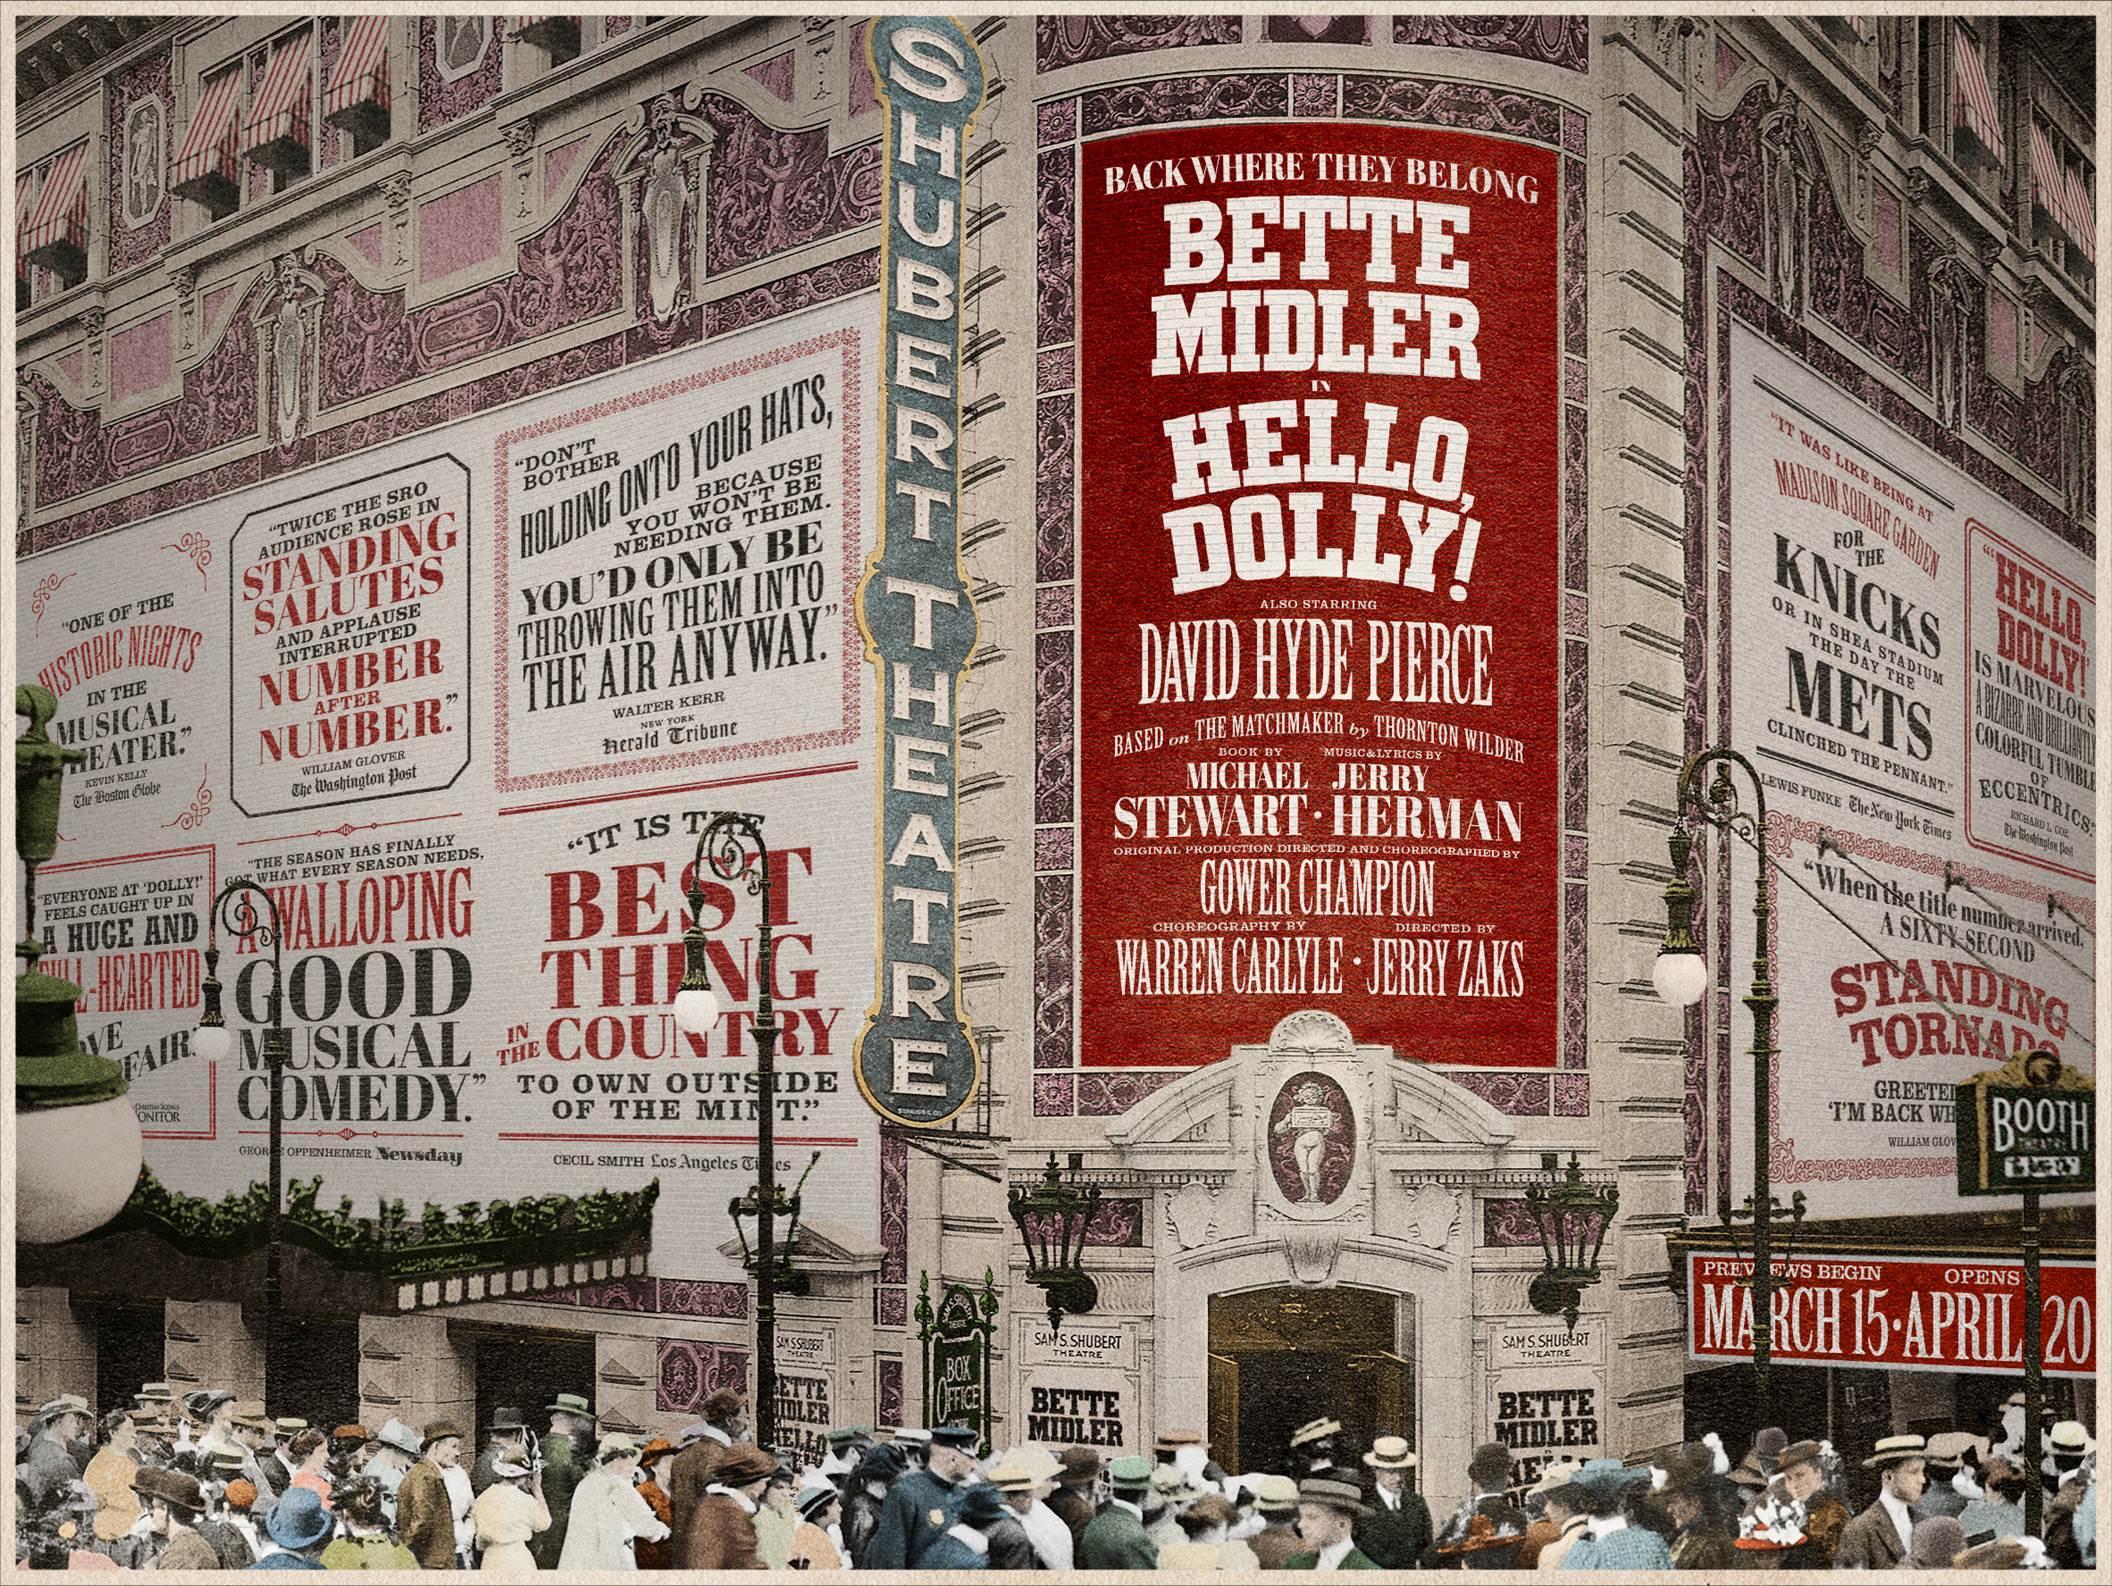 Hello Dolly Breaks Box fice Records Bette Midler